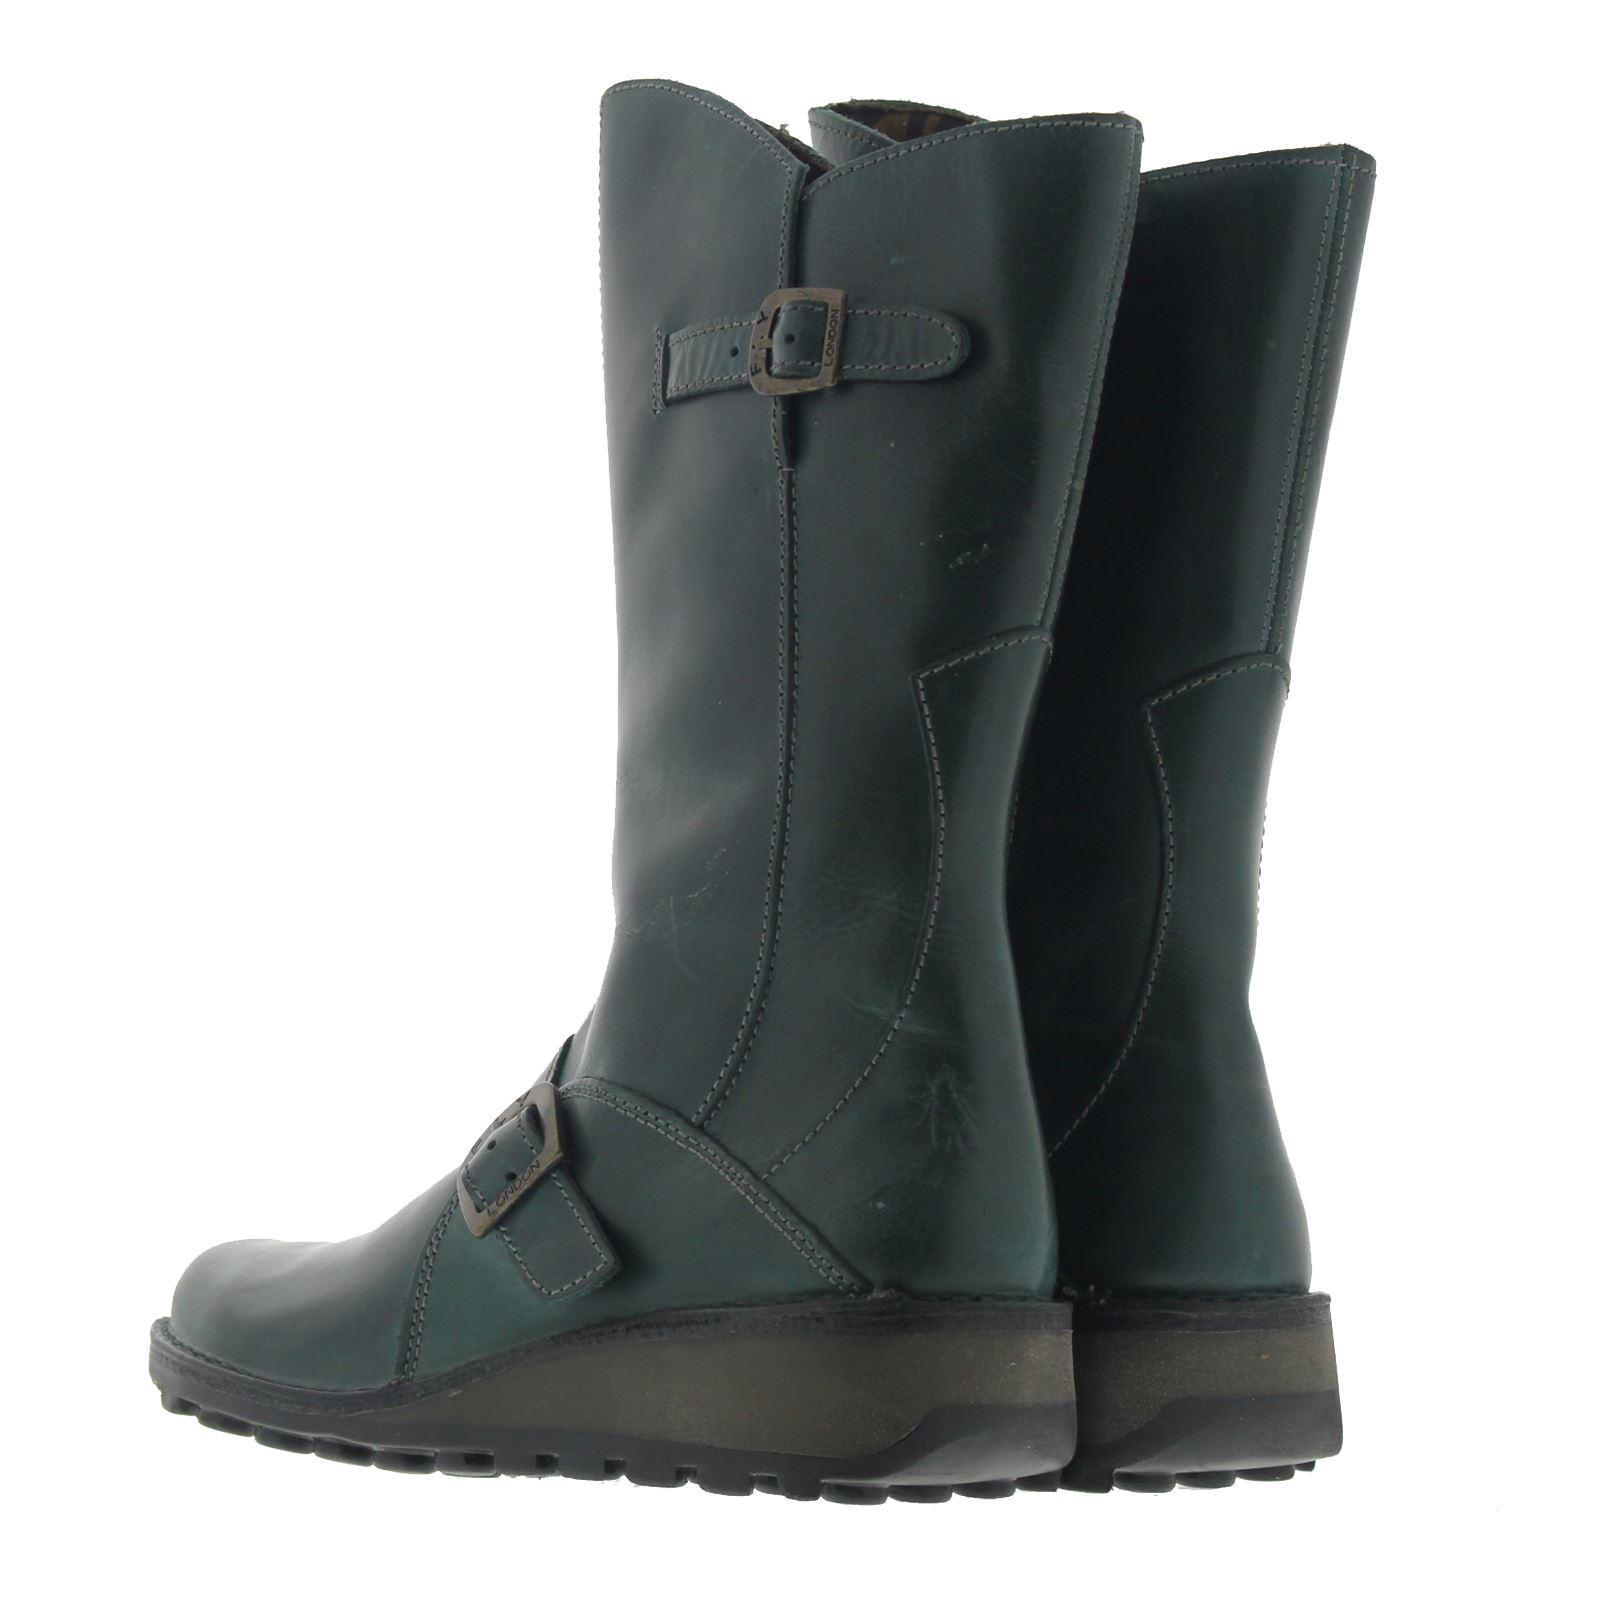 Fly-London-Mes-Leather-Womens-Zip-Up-Medium-Wedge-Heel-Biker-Buckle-Boots